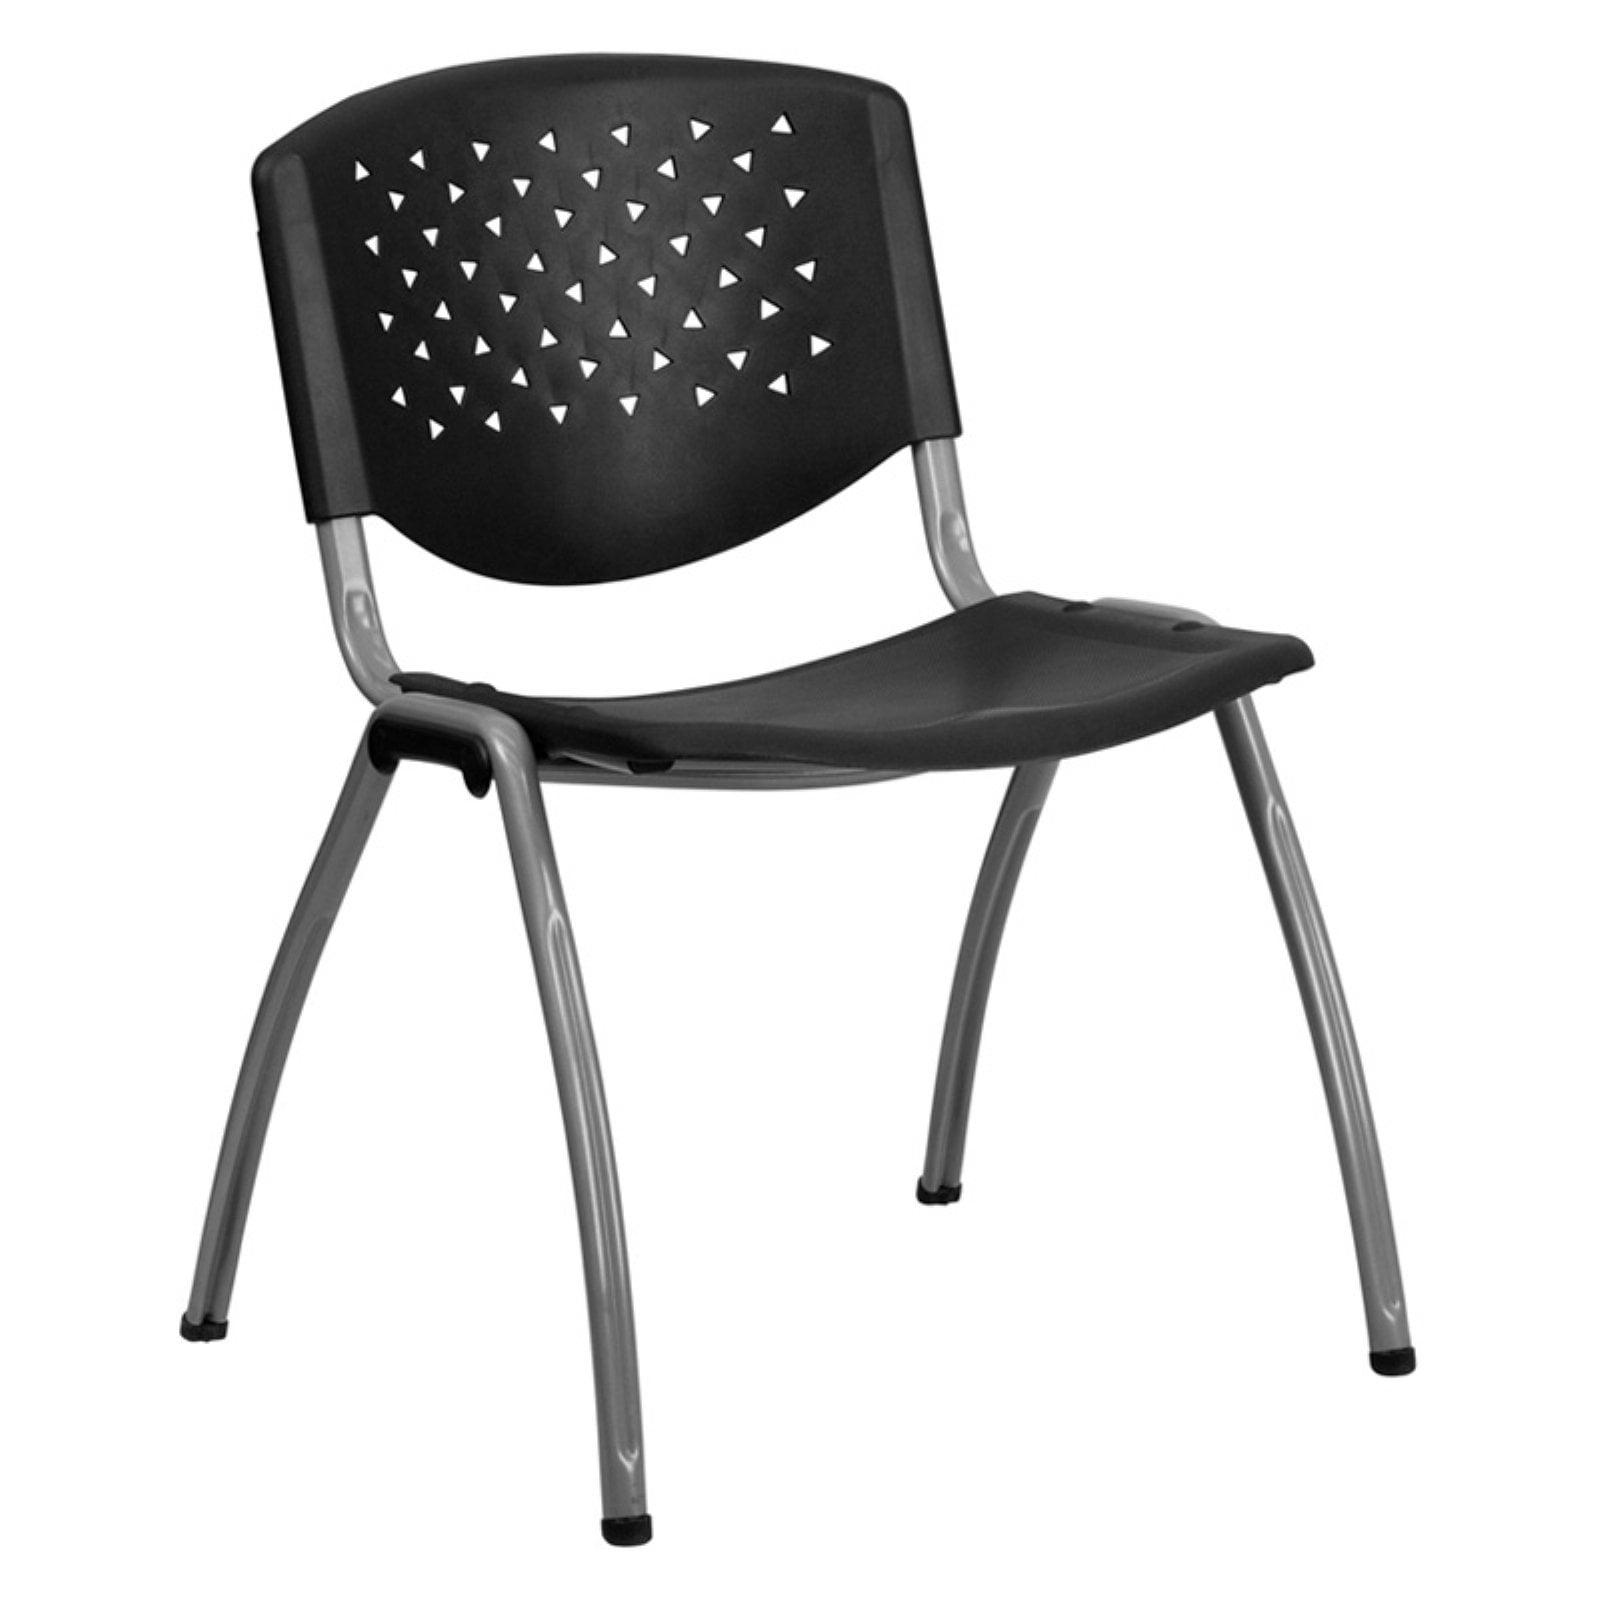 Flash Furniture HERCULES Series 880 lb. Capacity Black Plastic Stack Chair with Titanium Frame